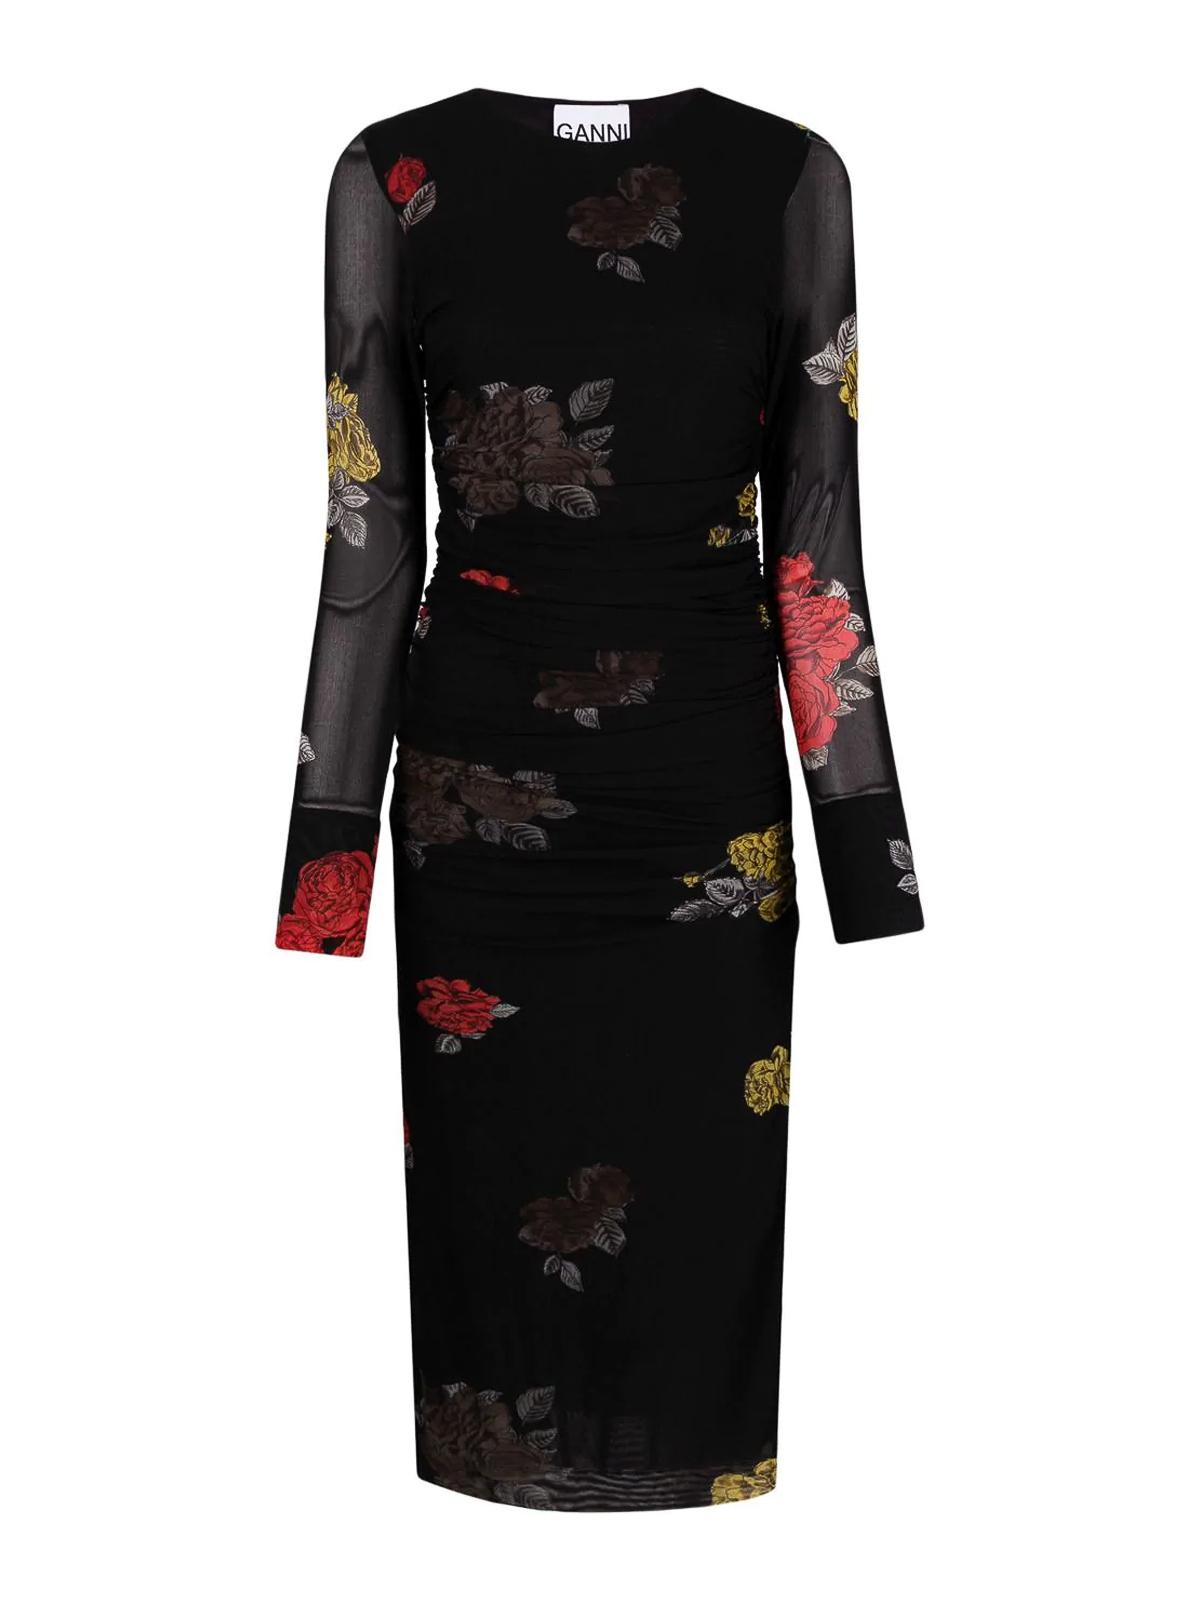 Ganni Dresses SHEATH BLACK DRESS